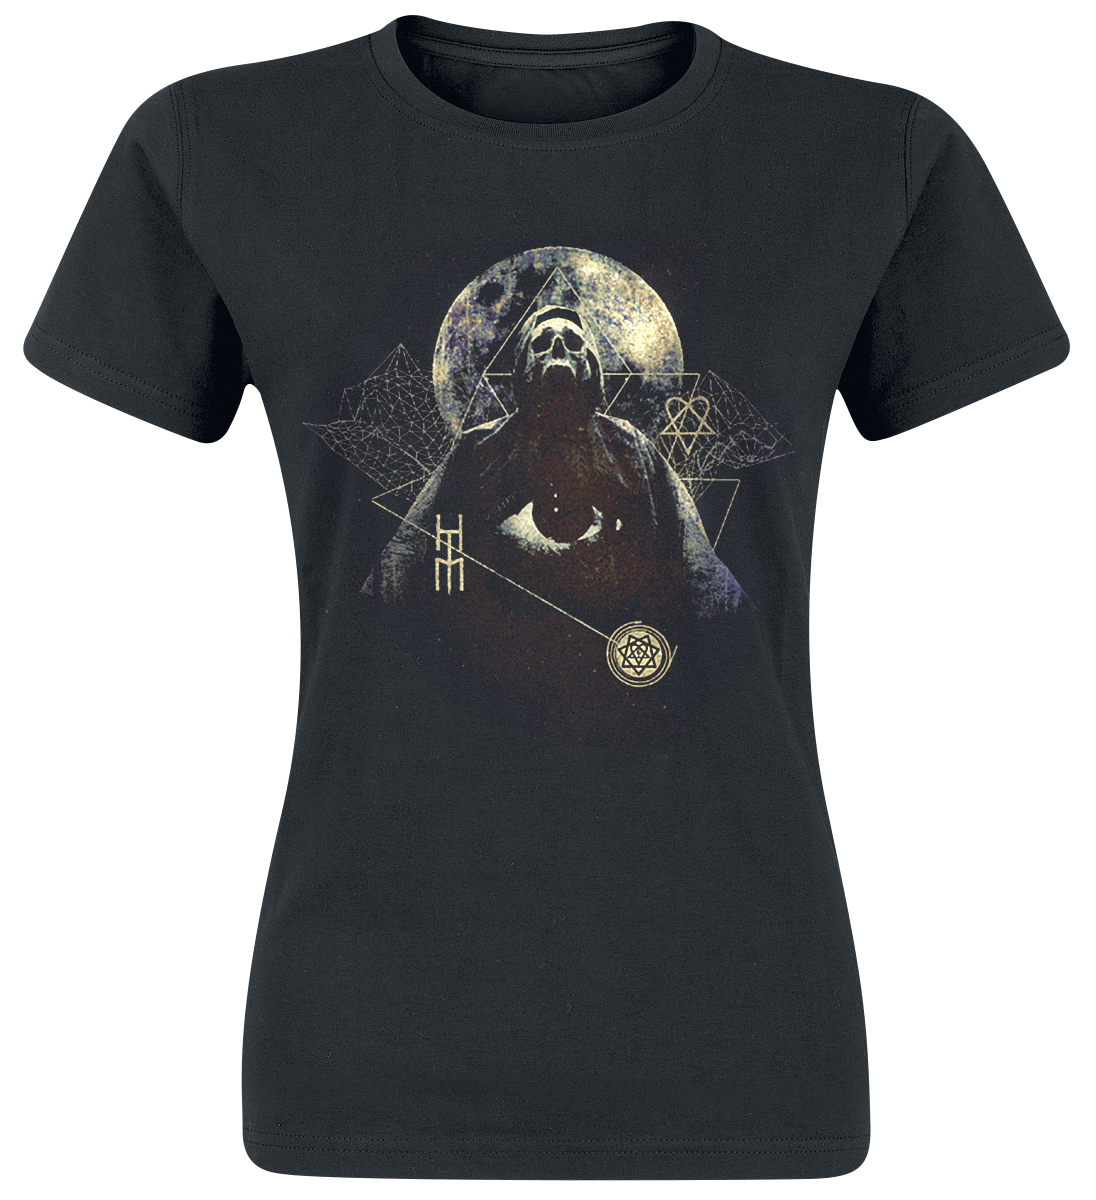 HIM - Death - Girls shirt - black image